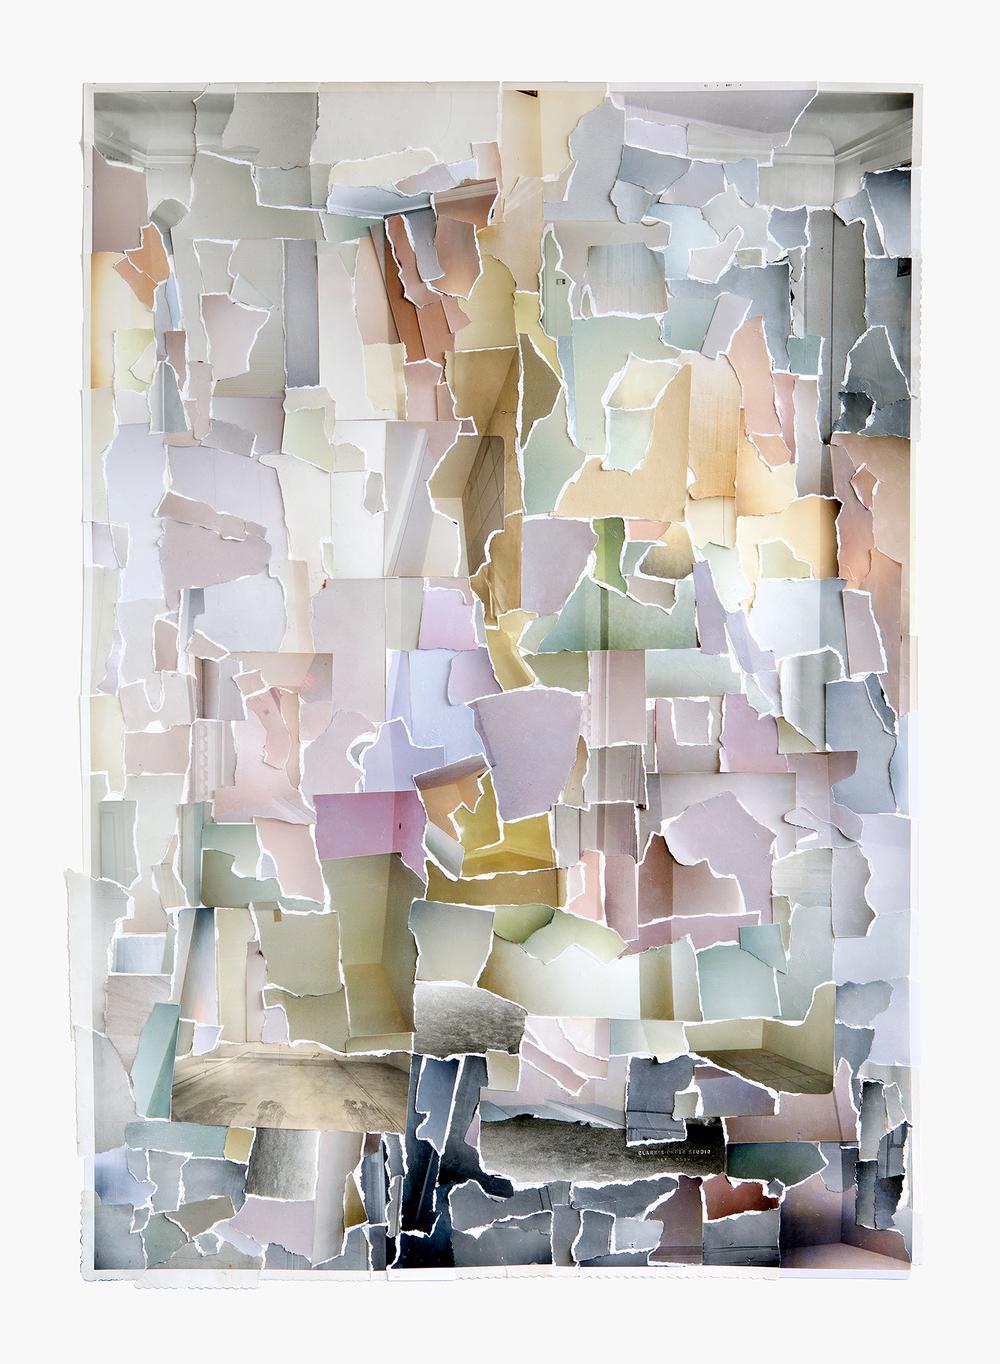 White Walls, 2016. © Joe Rudko